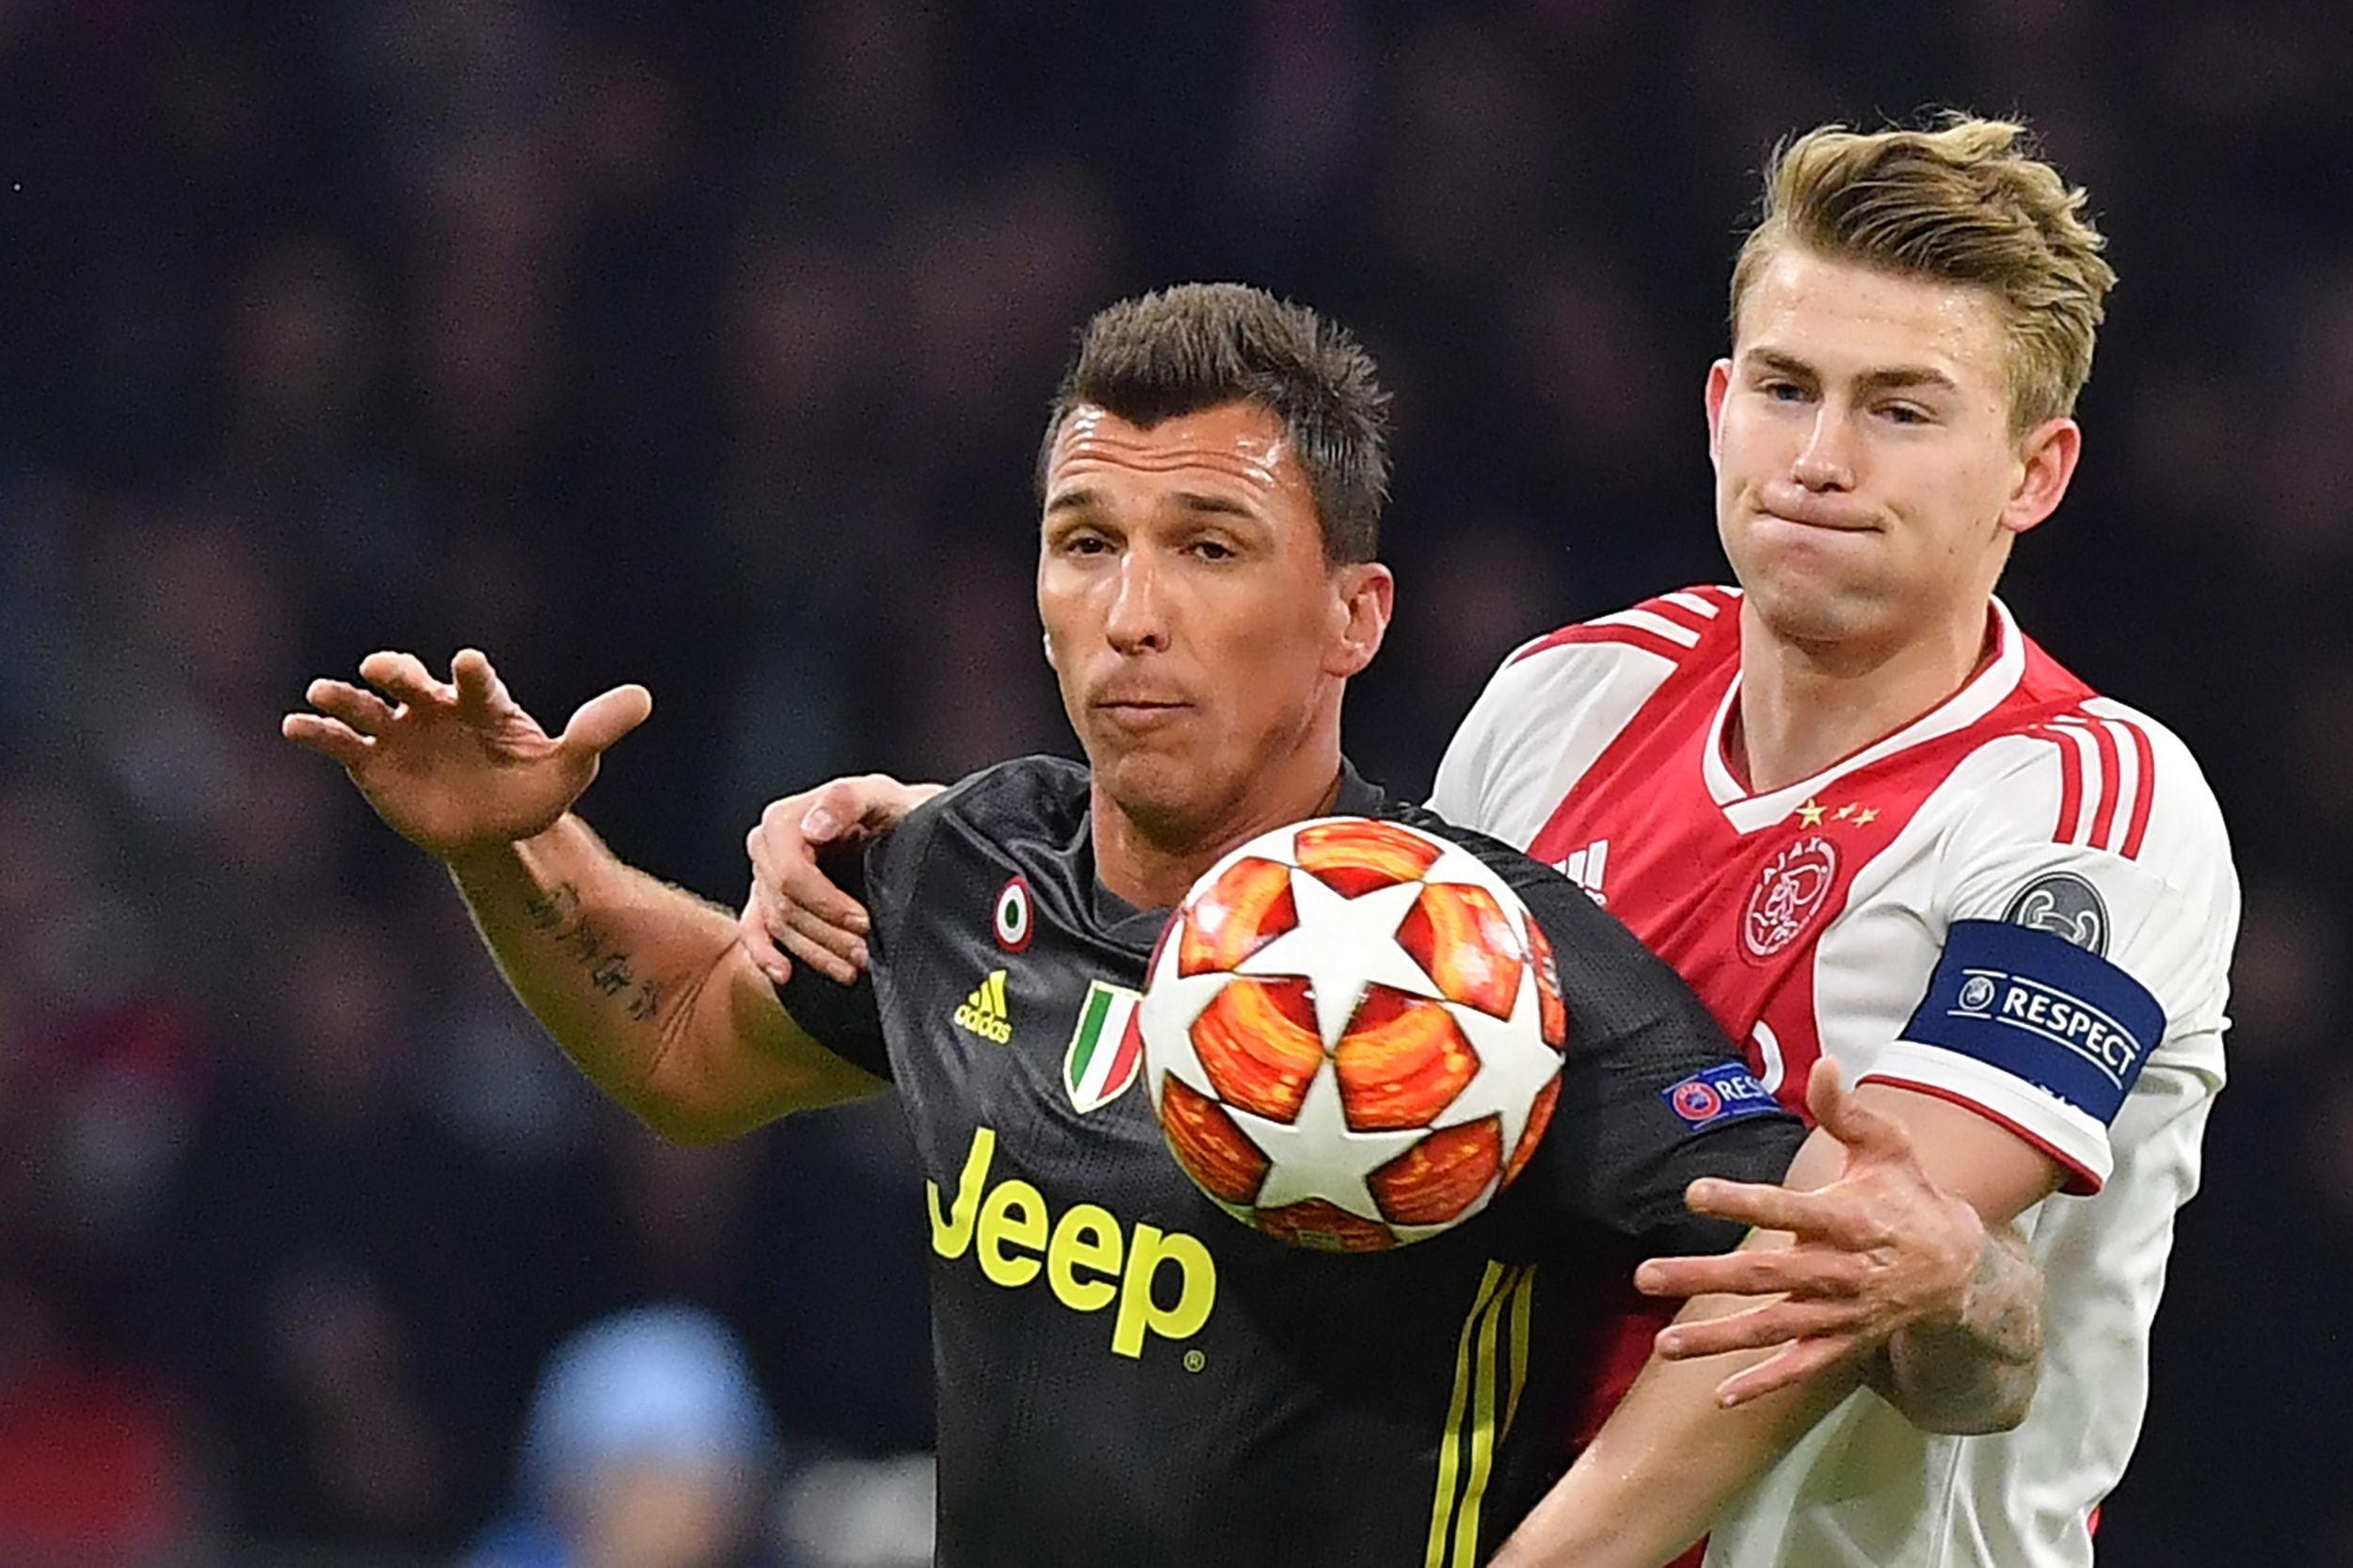 https://static.independent.co.uk/s3fs-public/thumbnails/image/2019/04/10/21/Ajax-vs-Juventus-19.jpg